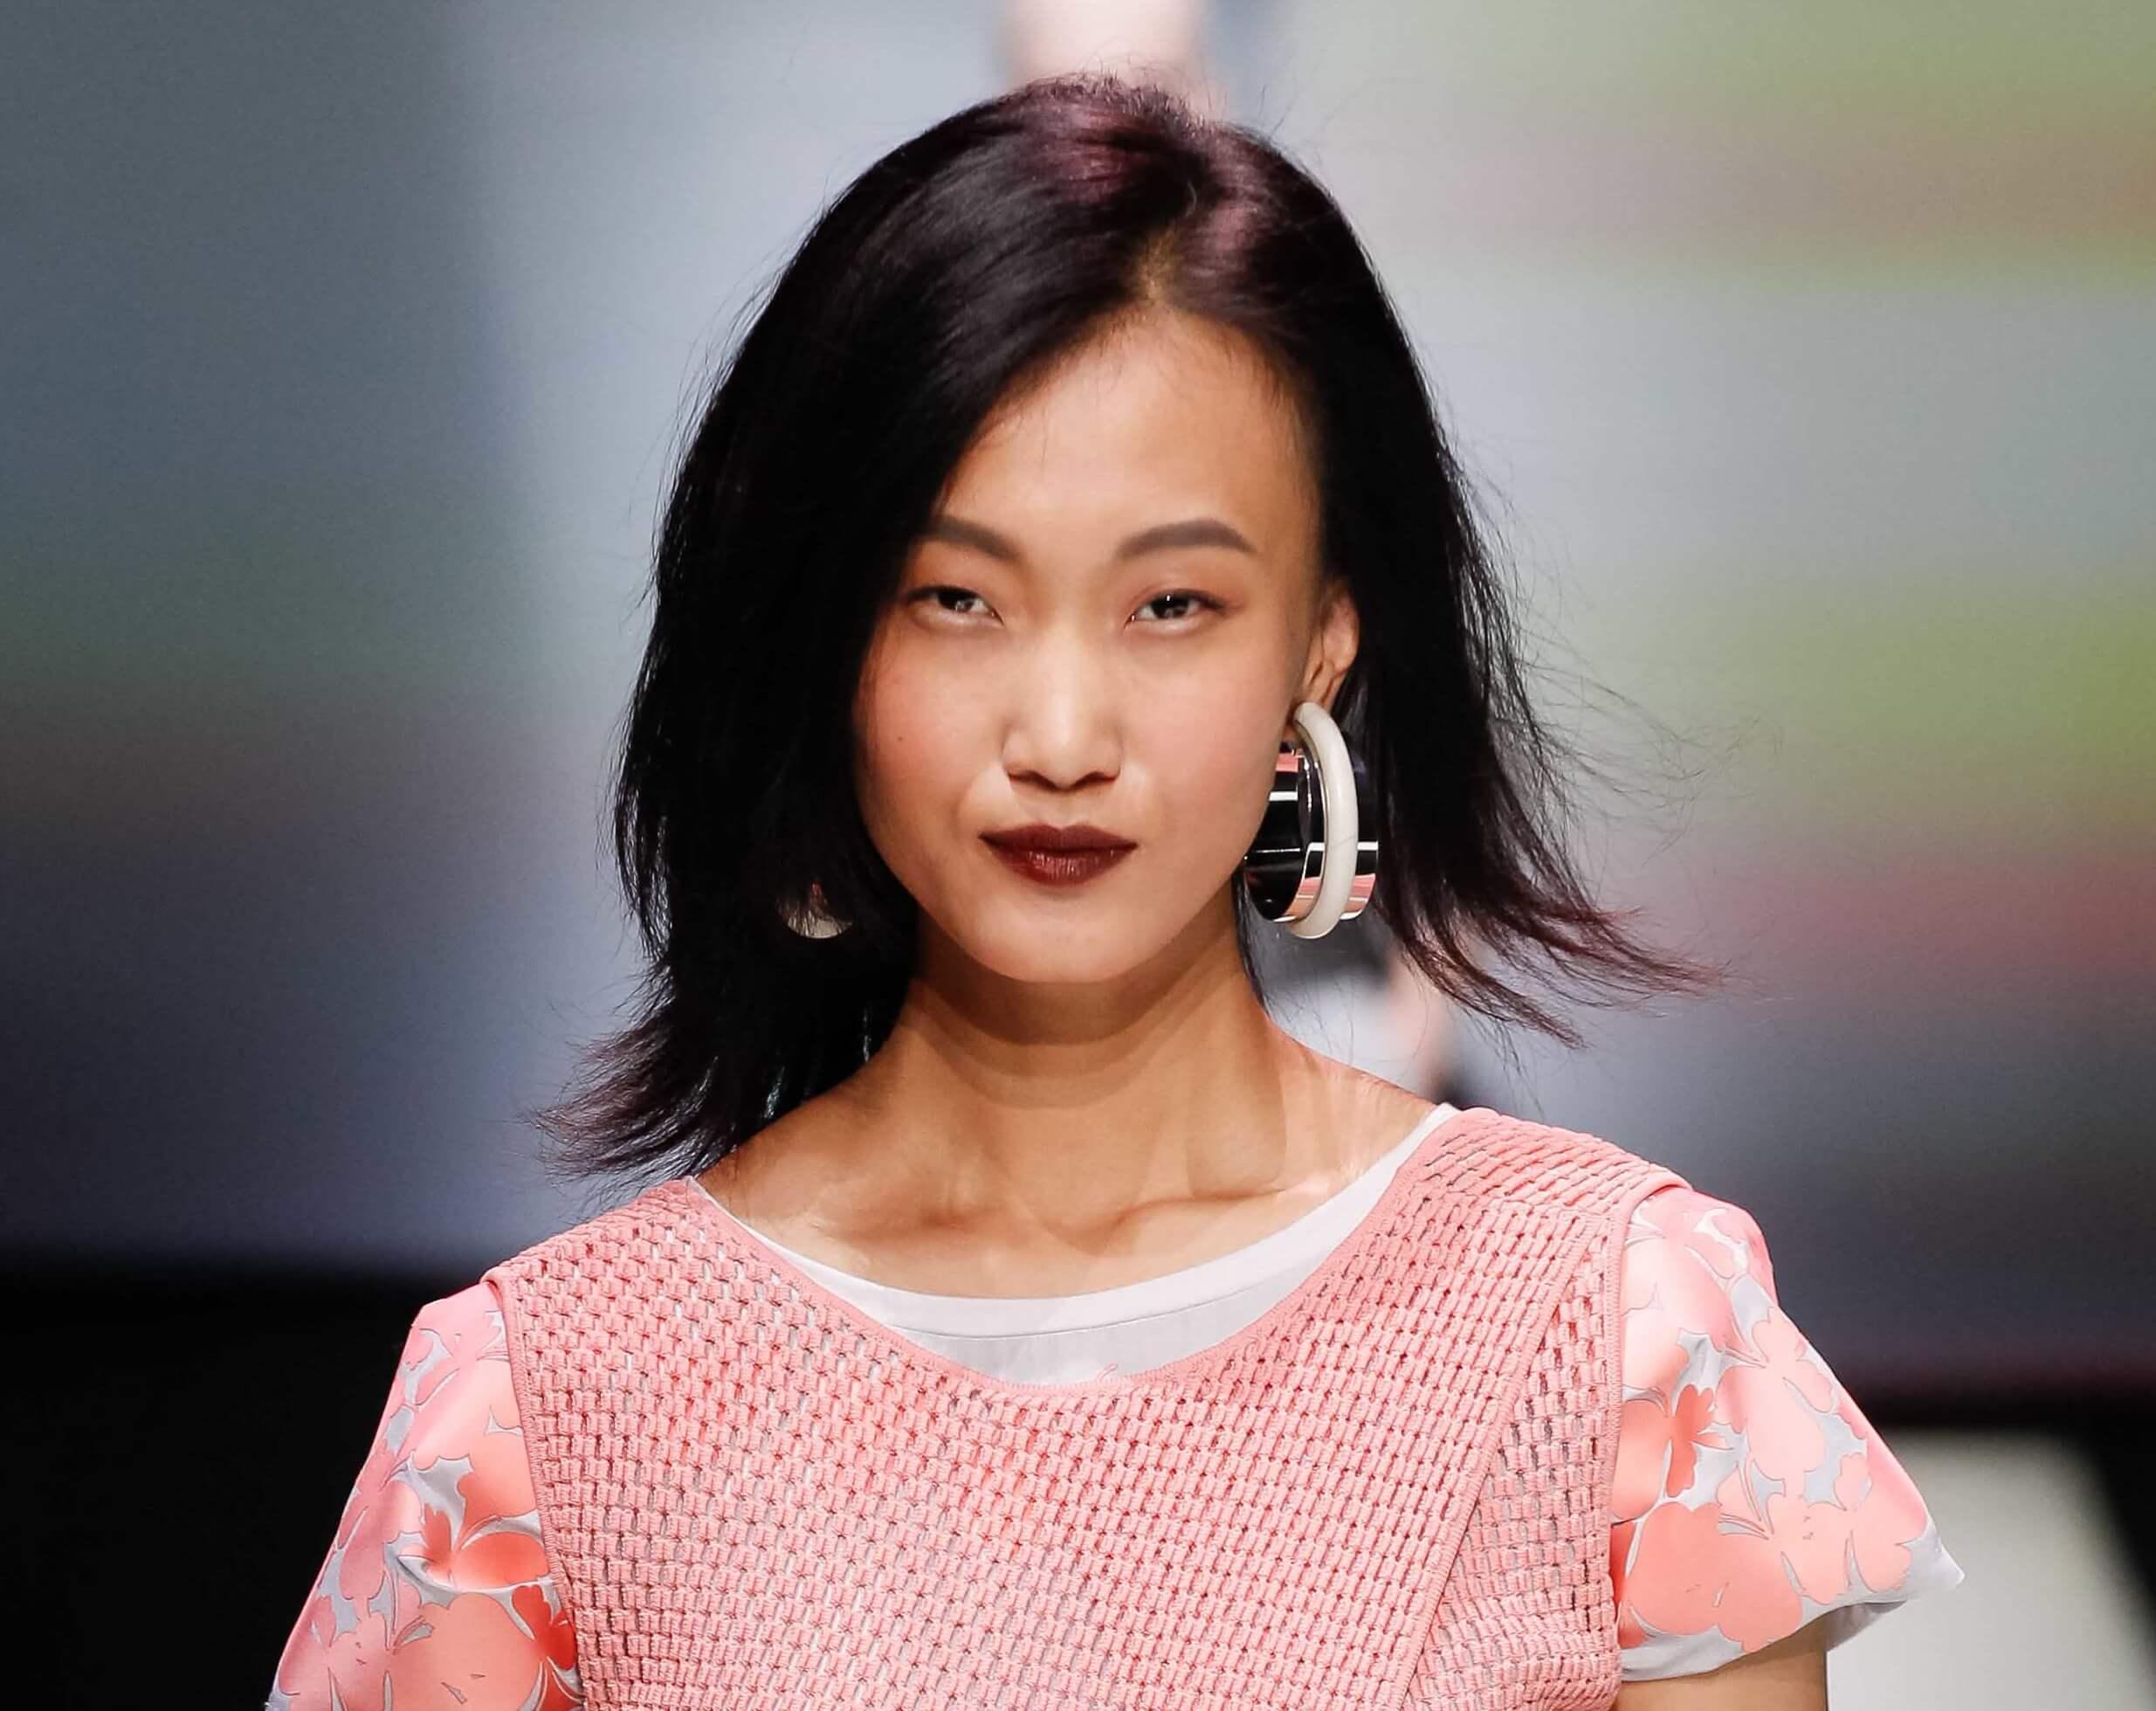 asymmetric cut short haircuts for long faces